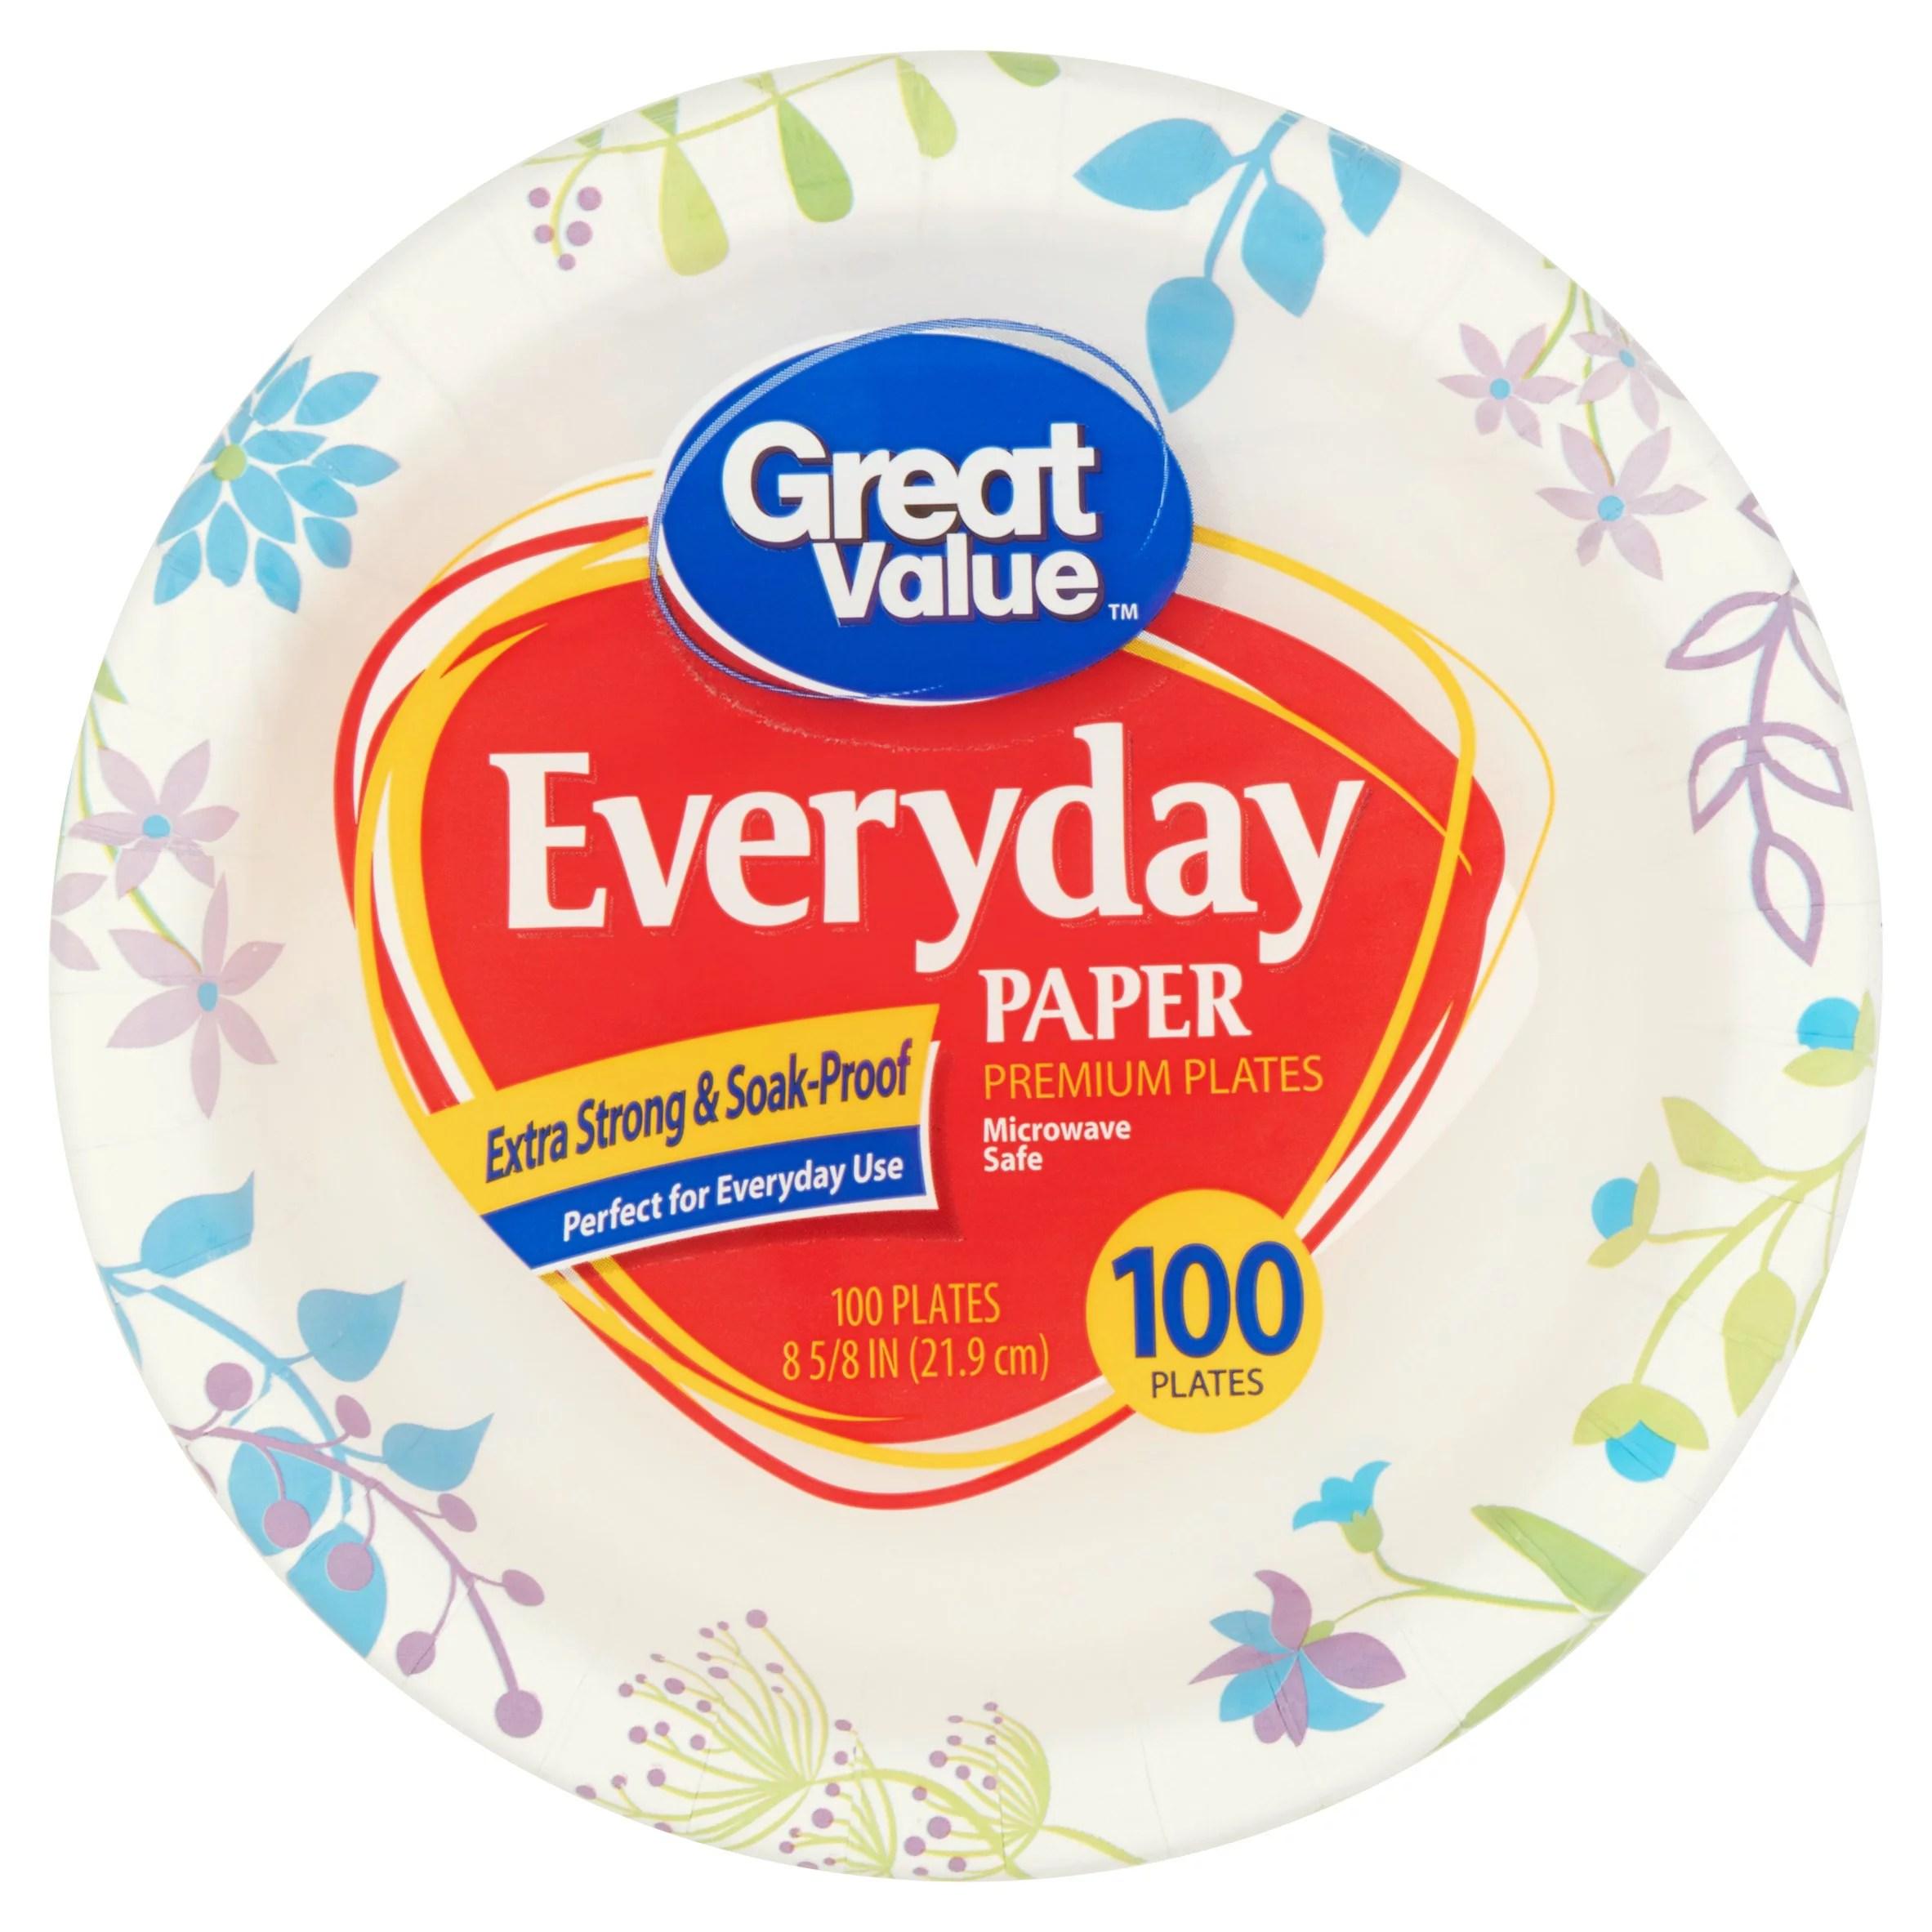 Great Value Everyday Paper Premium Plates 100 count